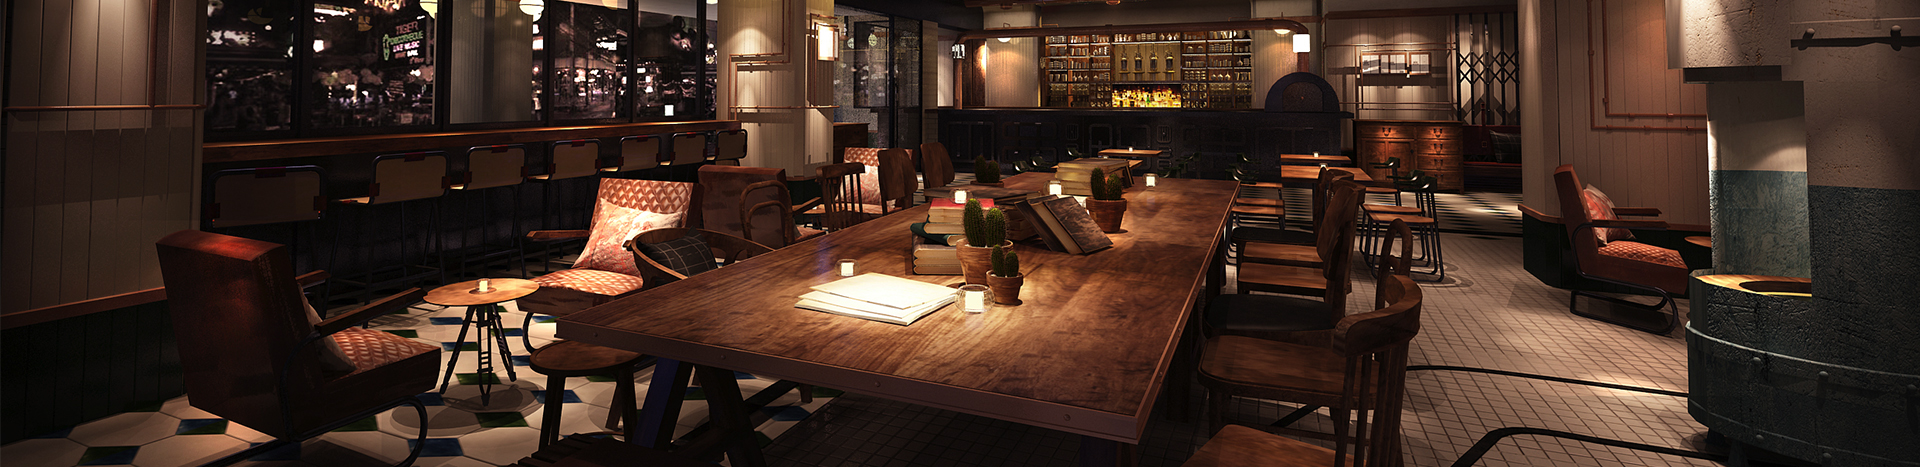 mercure-lobby-as-brewery-architecture-bangkok-sohohospitality